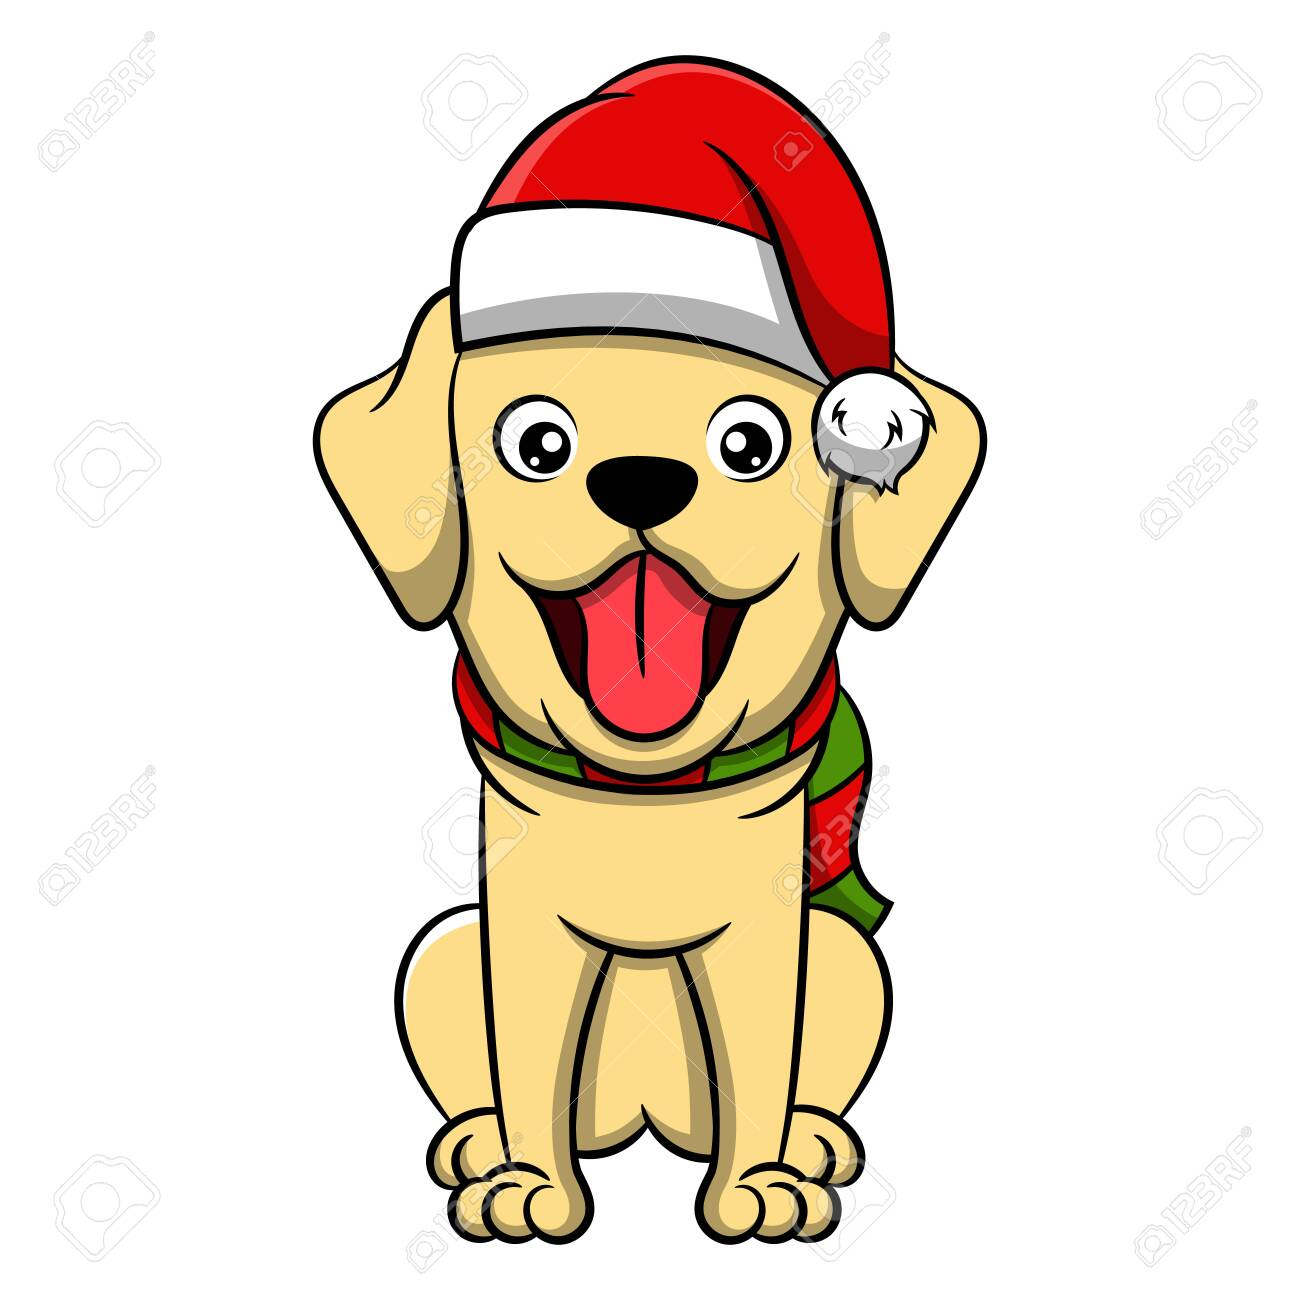 Merry Christmas Golden Retriever Cartoon Dog Vector Illustration Royalty Free Cliparts Vectors And Stock Illustration Image 128057927